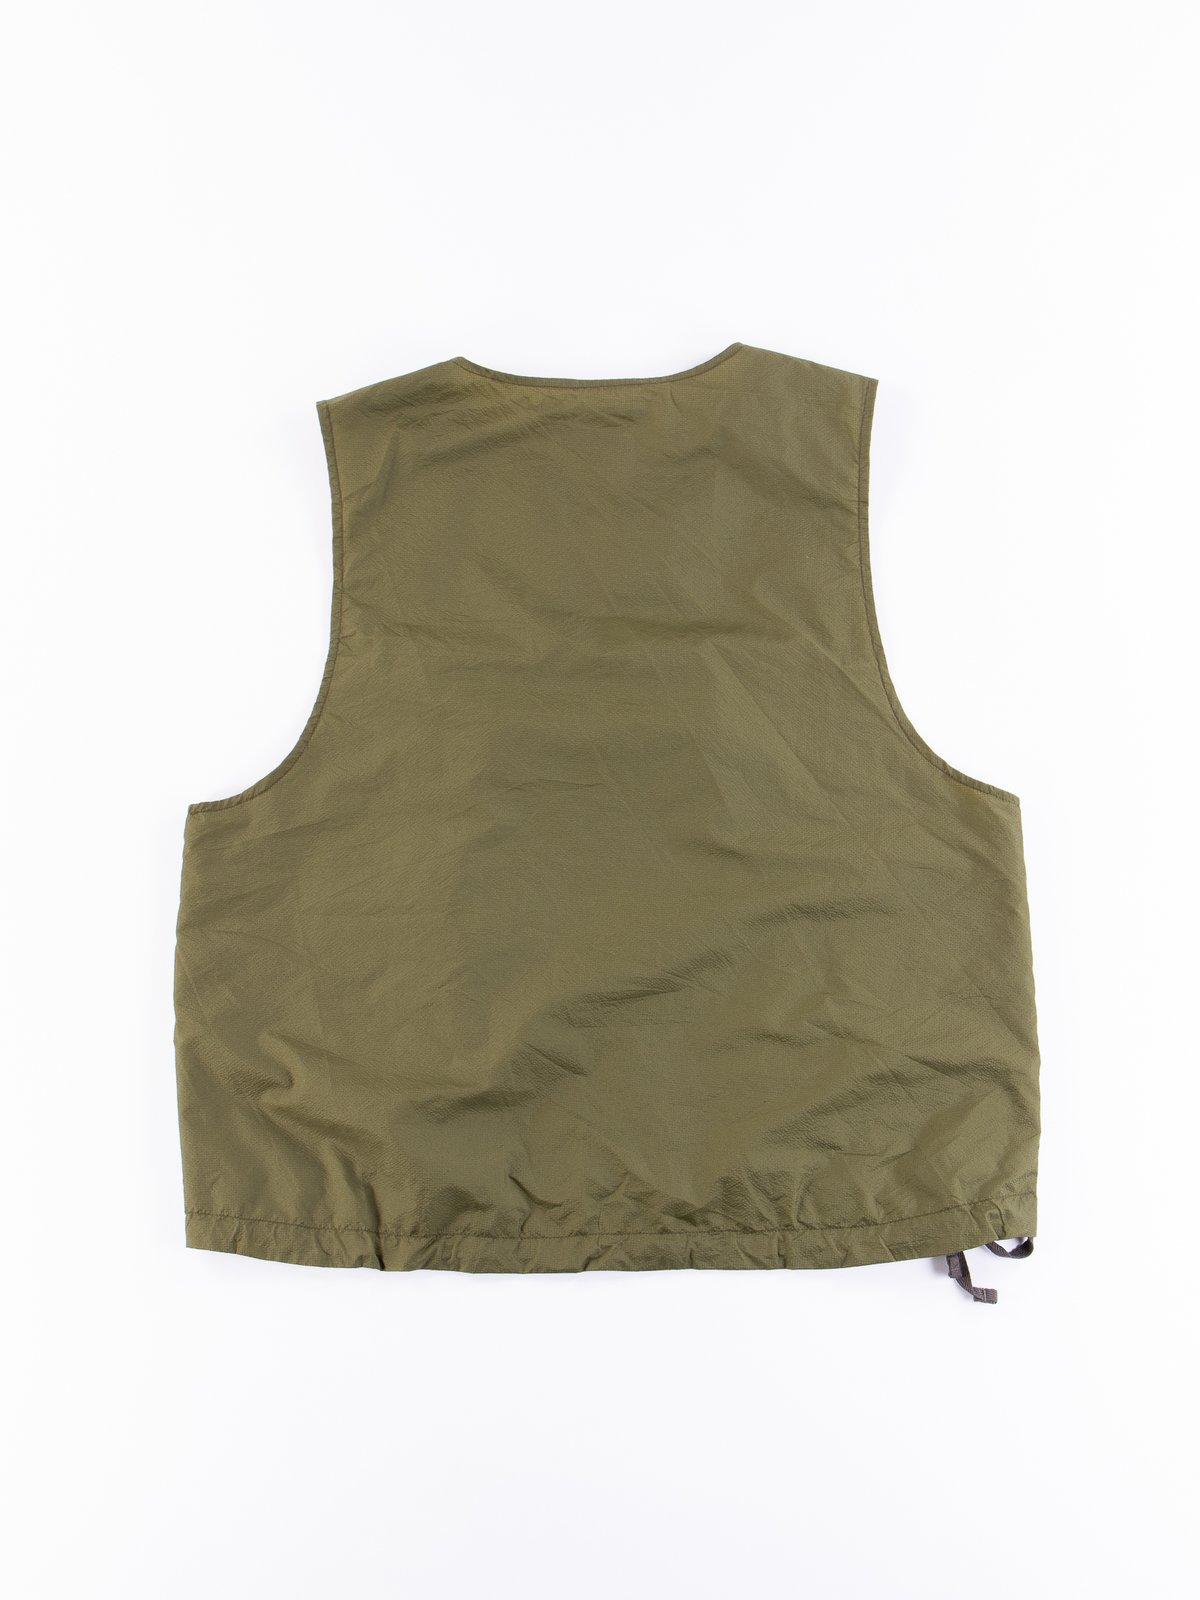 Olive Nylon Micro Ripstop Cover Vest - Image 5